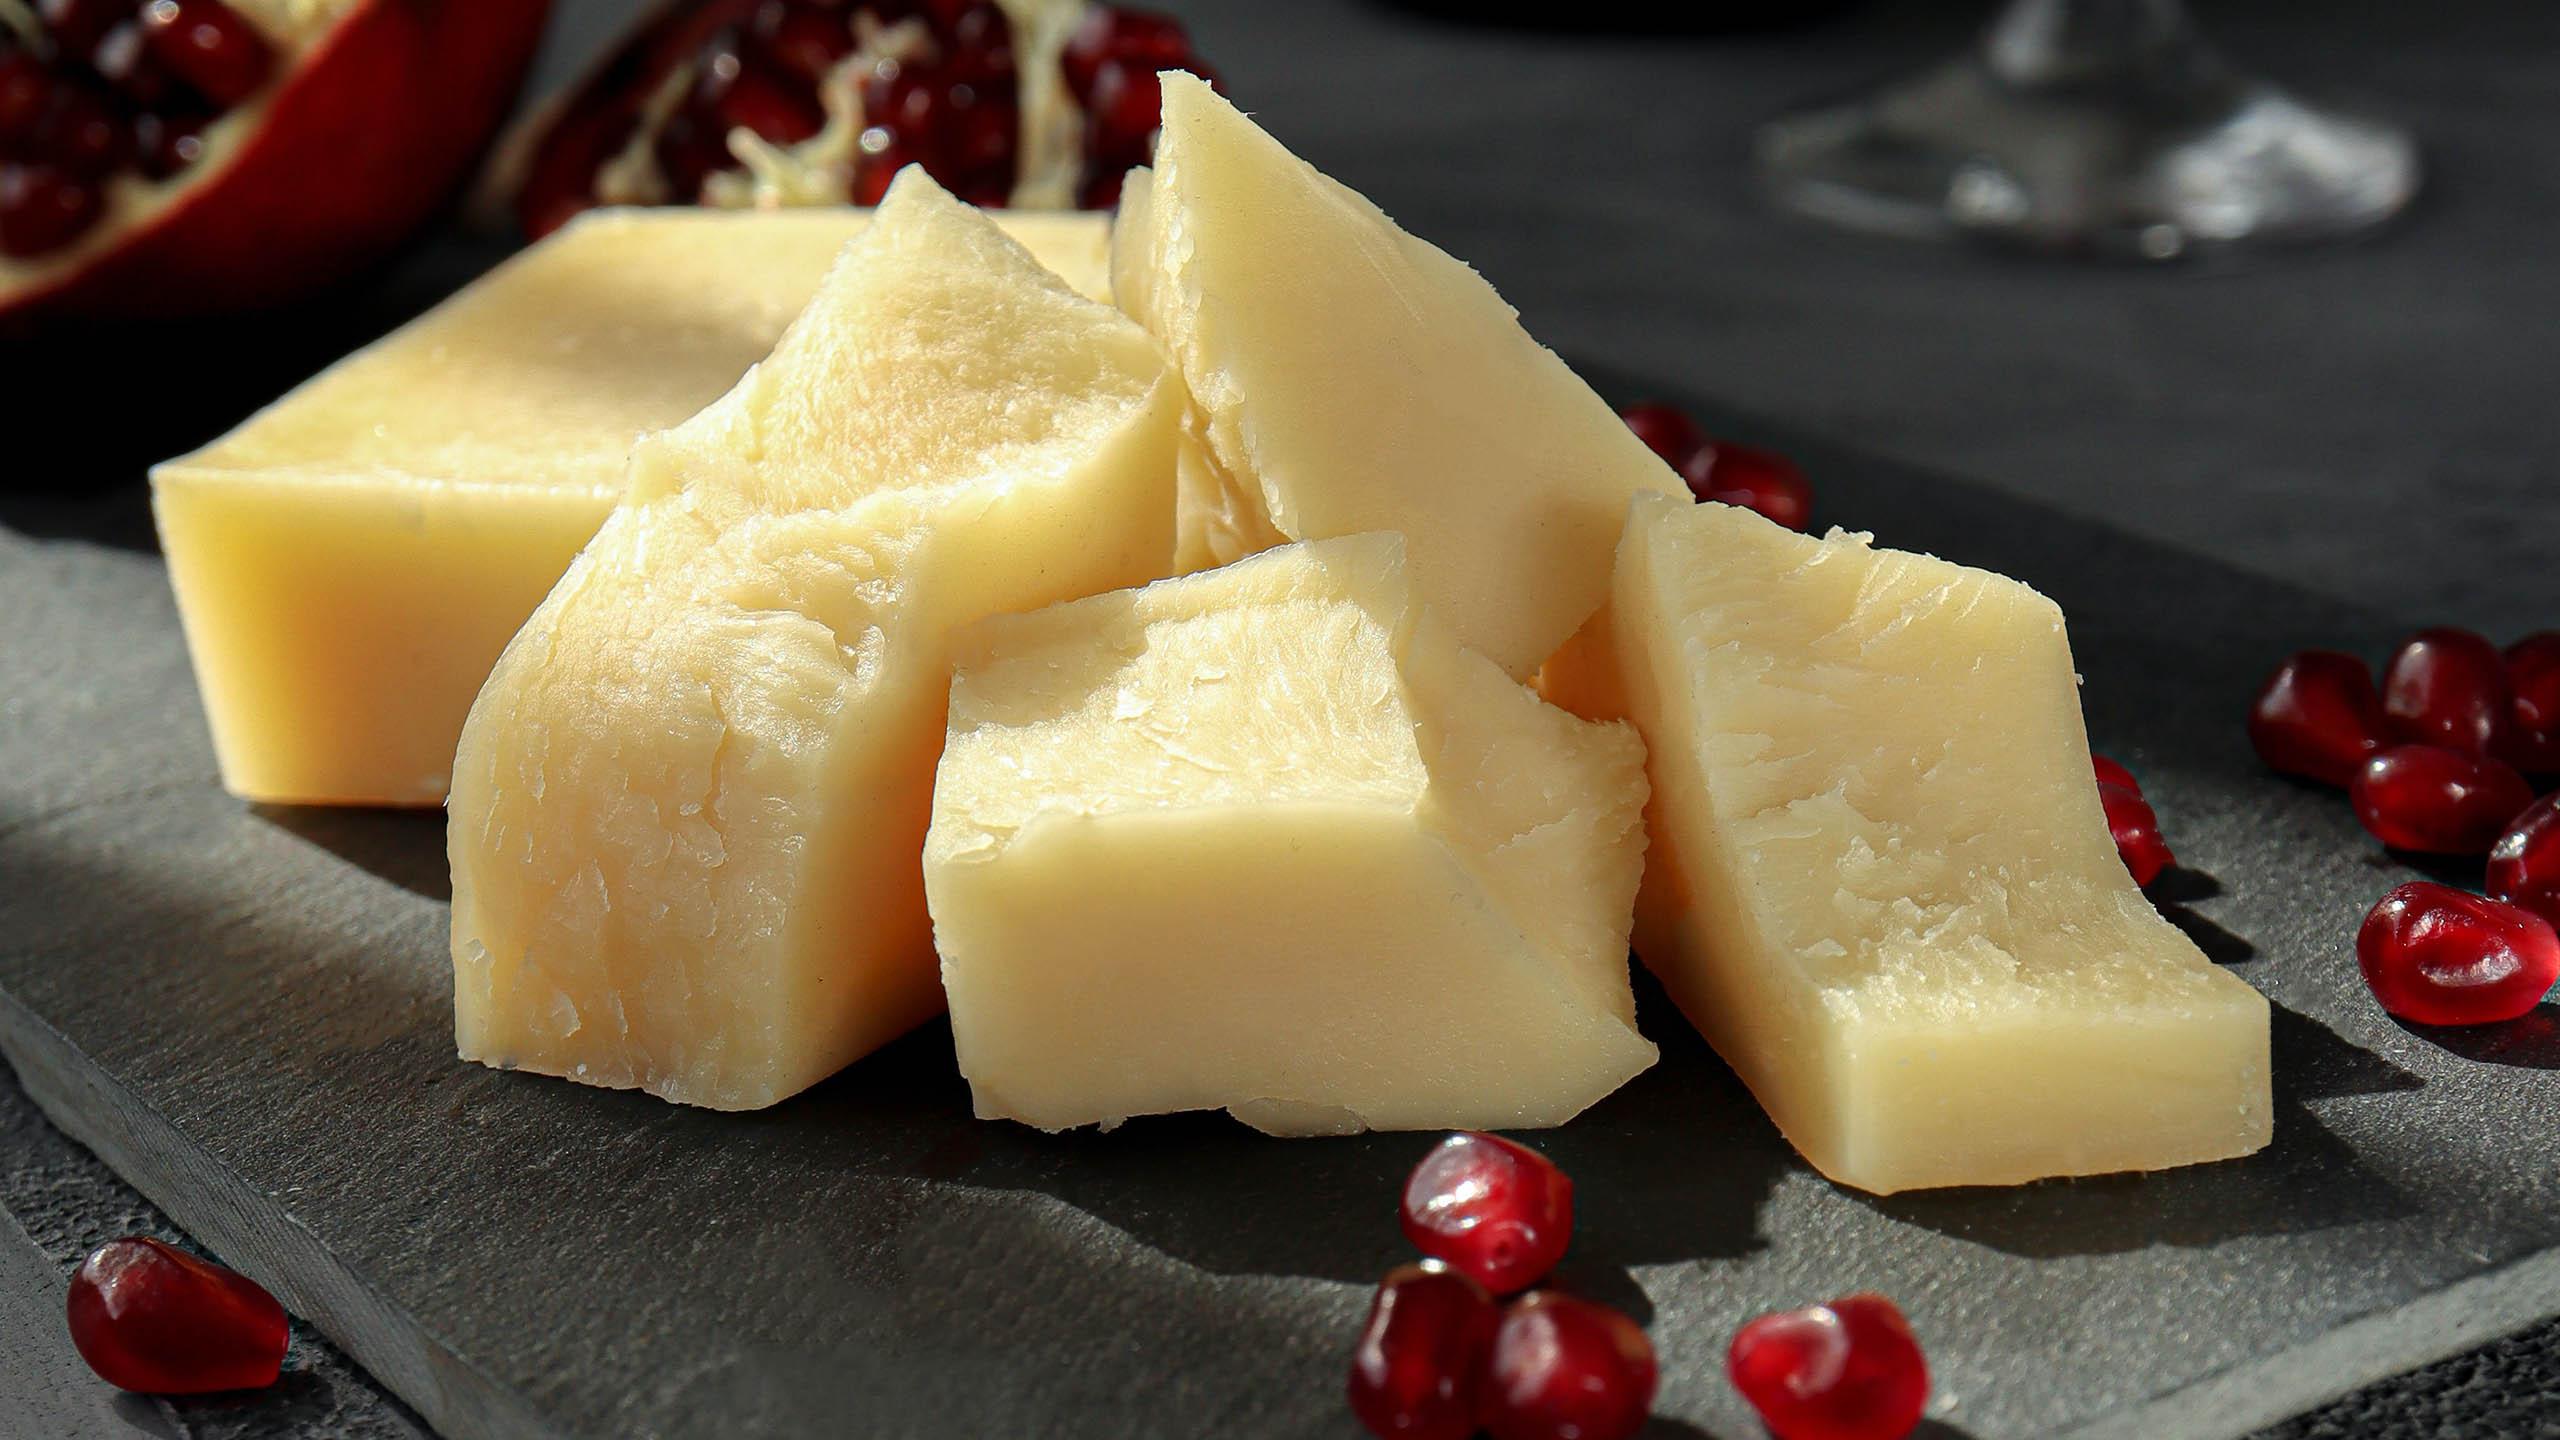 queso, cubos de queso, Philadelphia, Lala